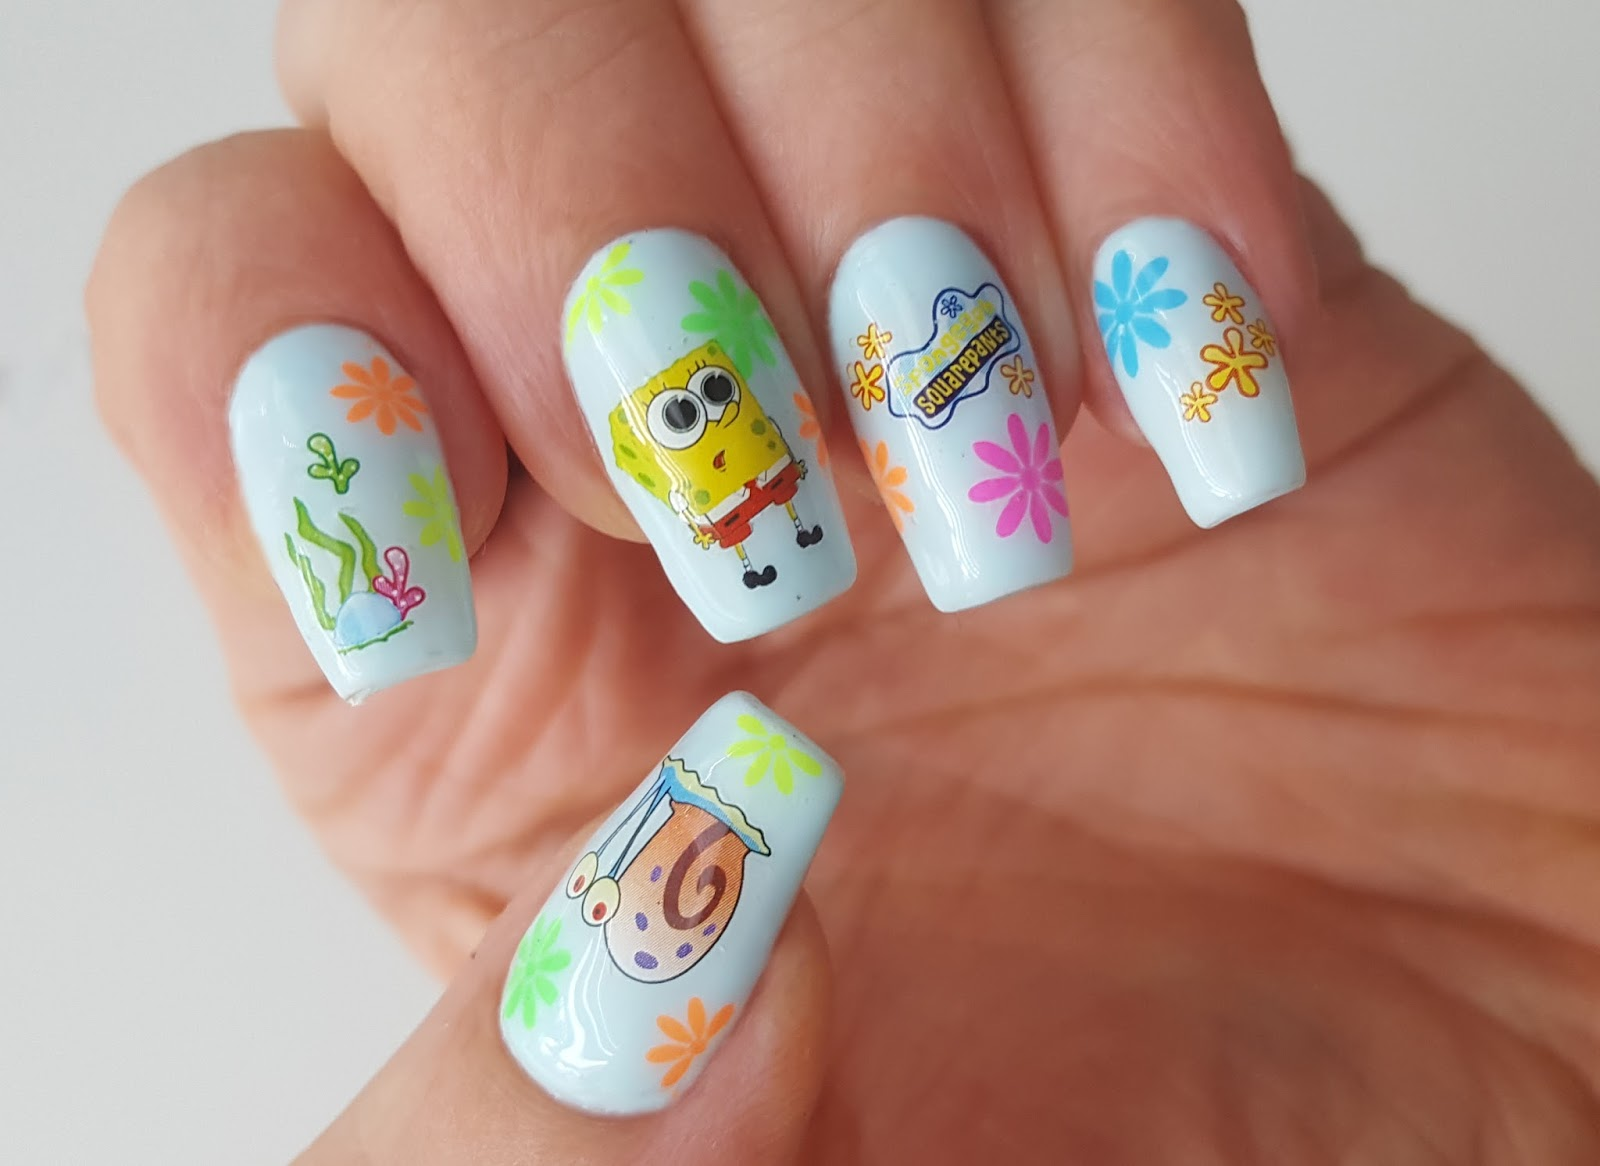 Mno - Spongebob nail decals